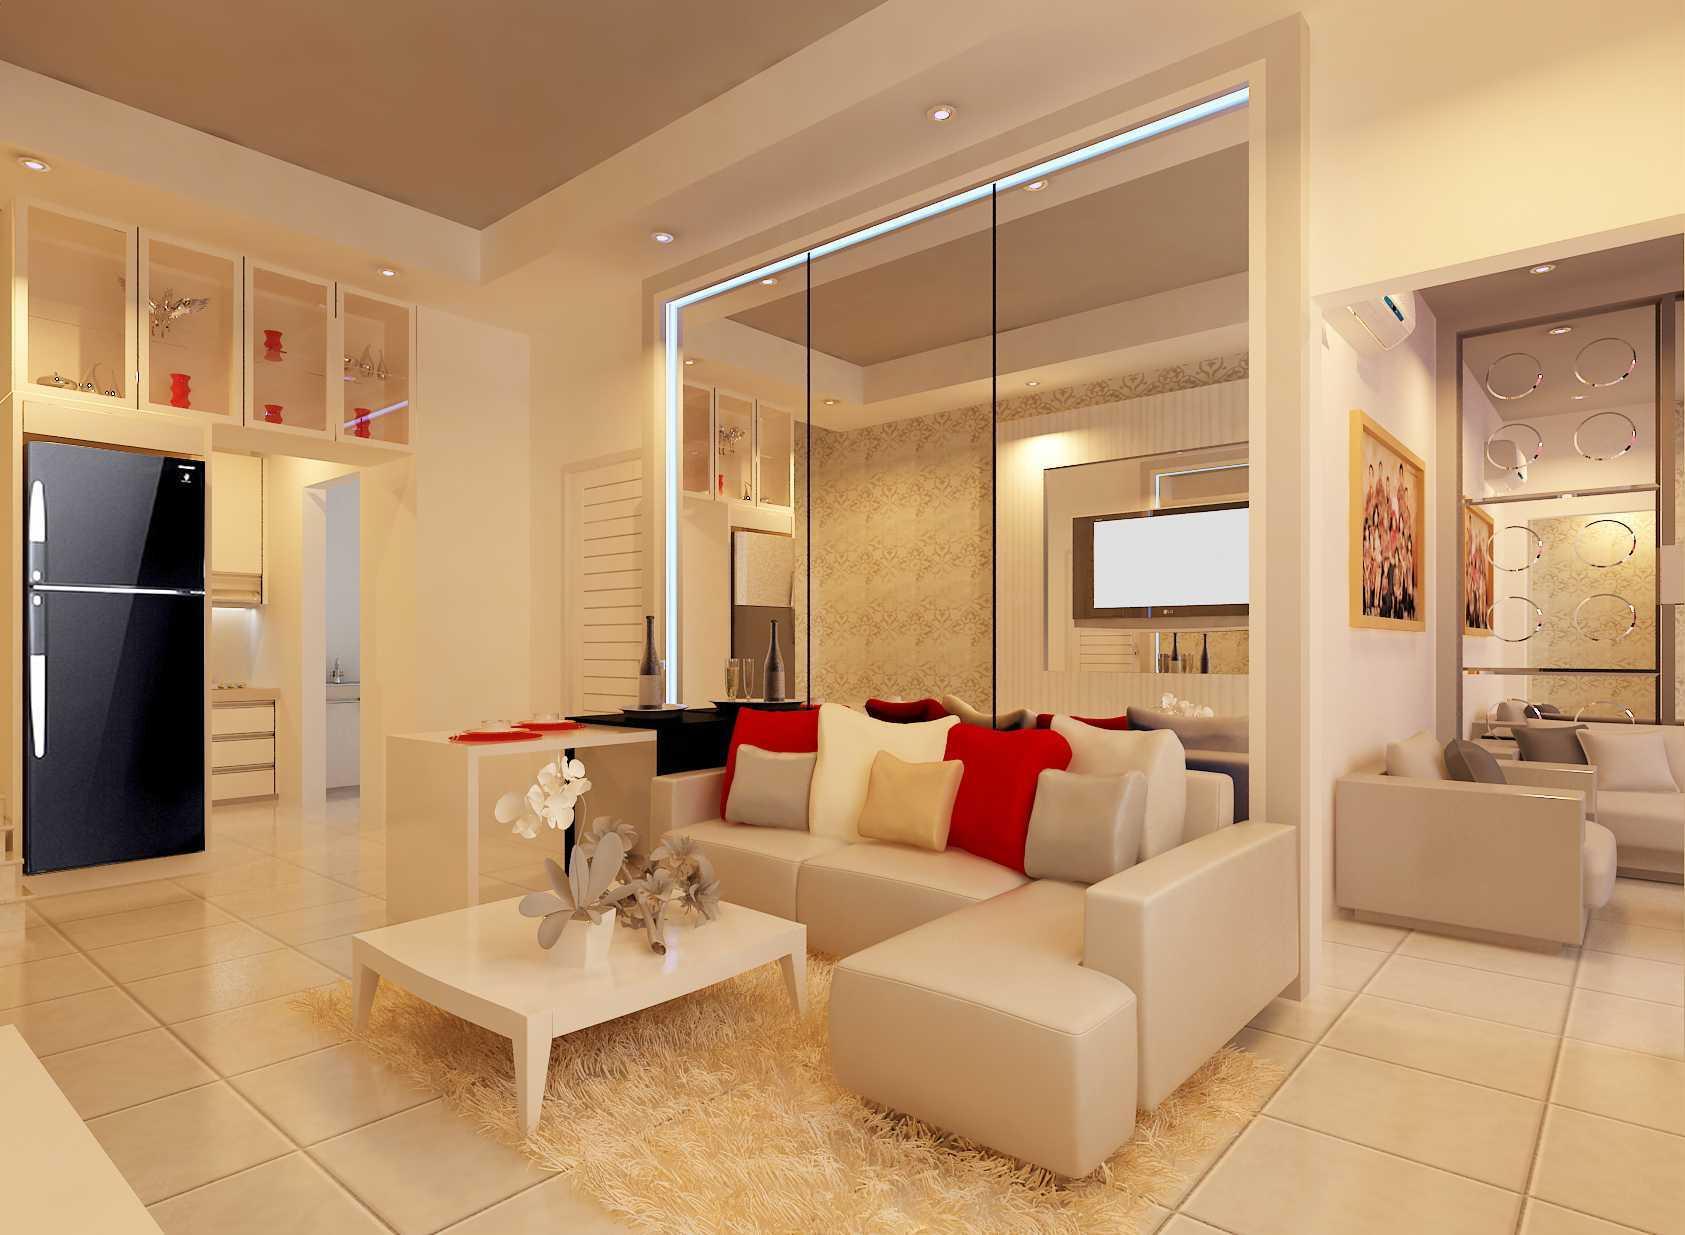 Yohanes Khouw Marshal House At Pulomas Jakarta Jakarta Lantai-1Sofarev1 Modern  26175